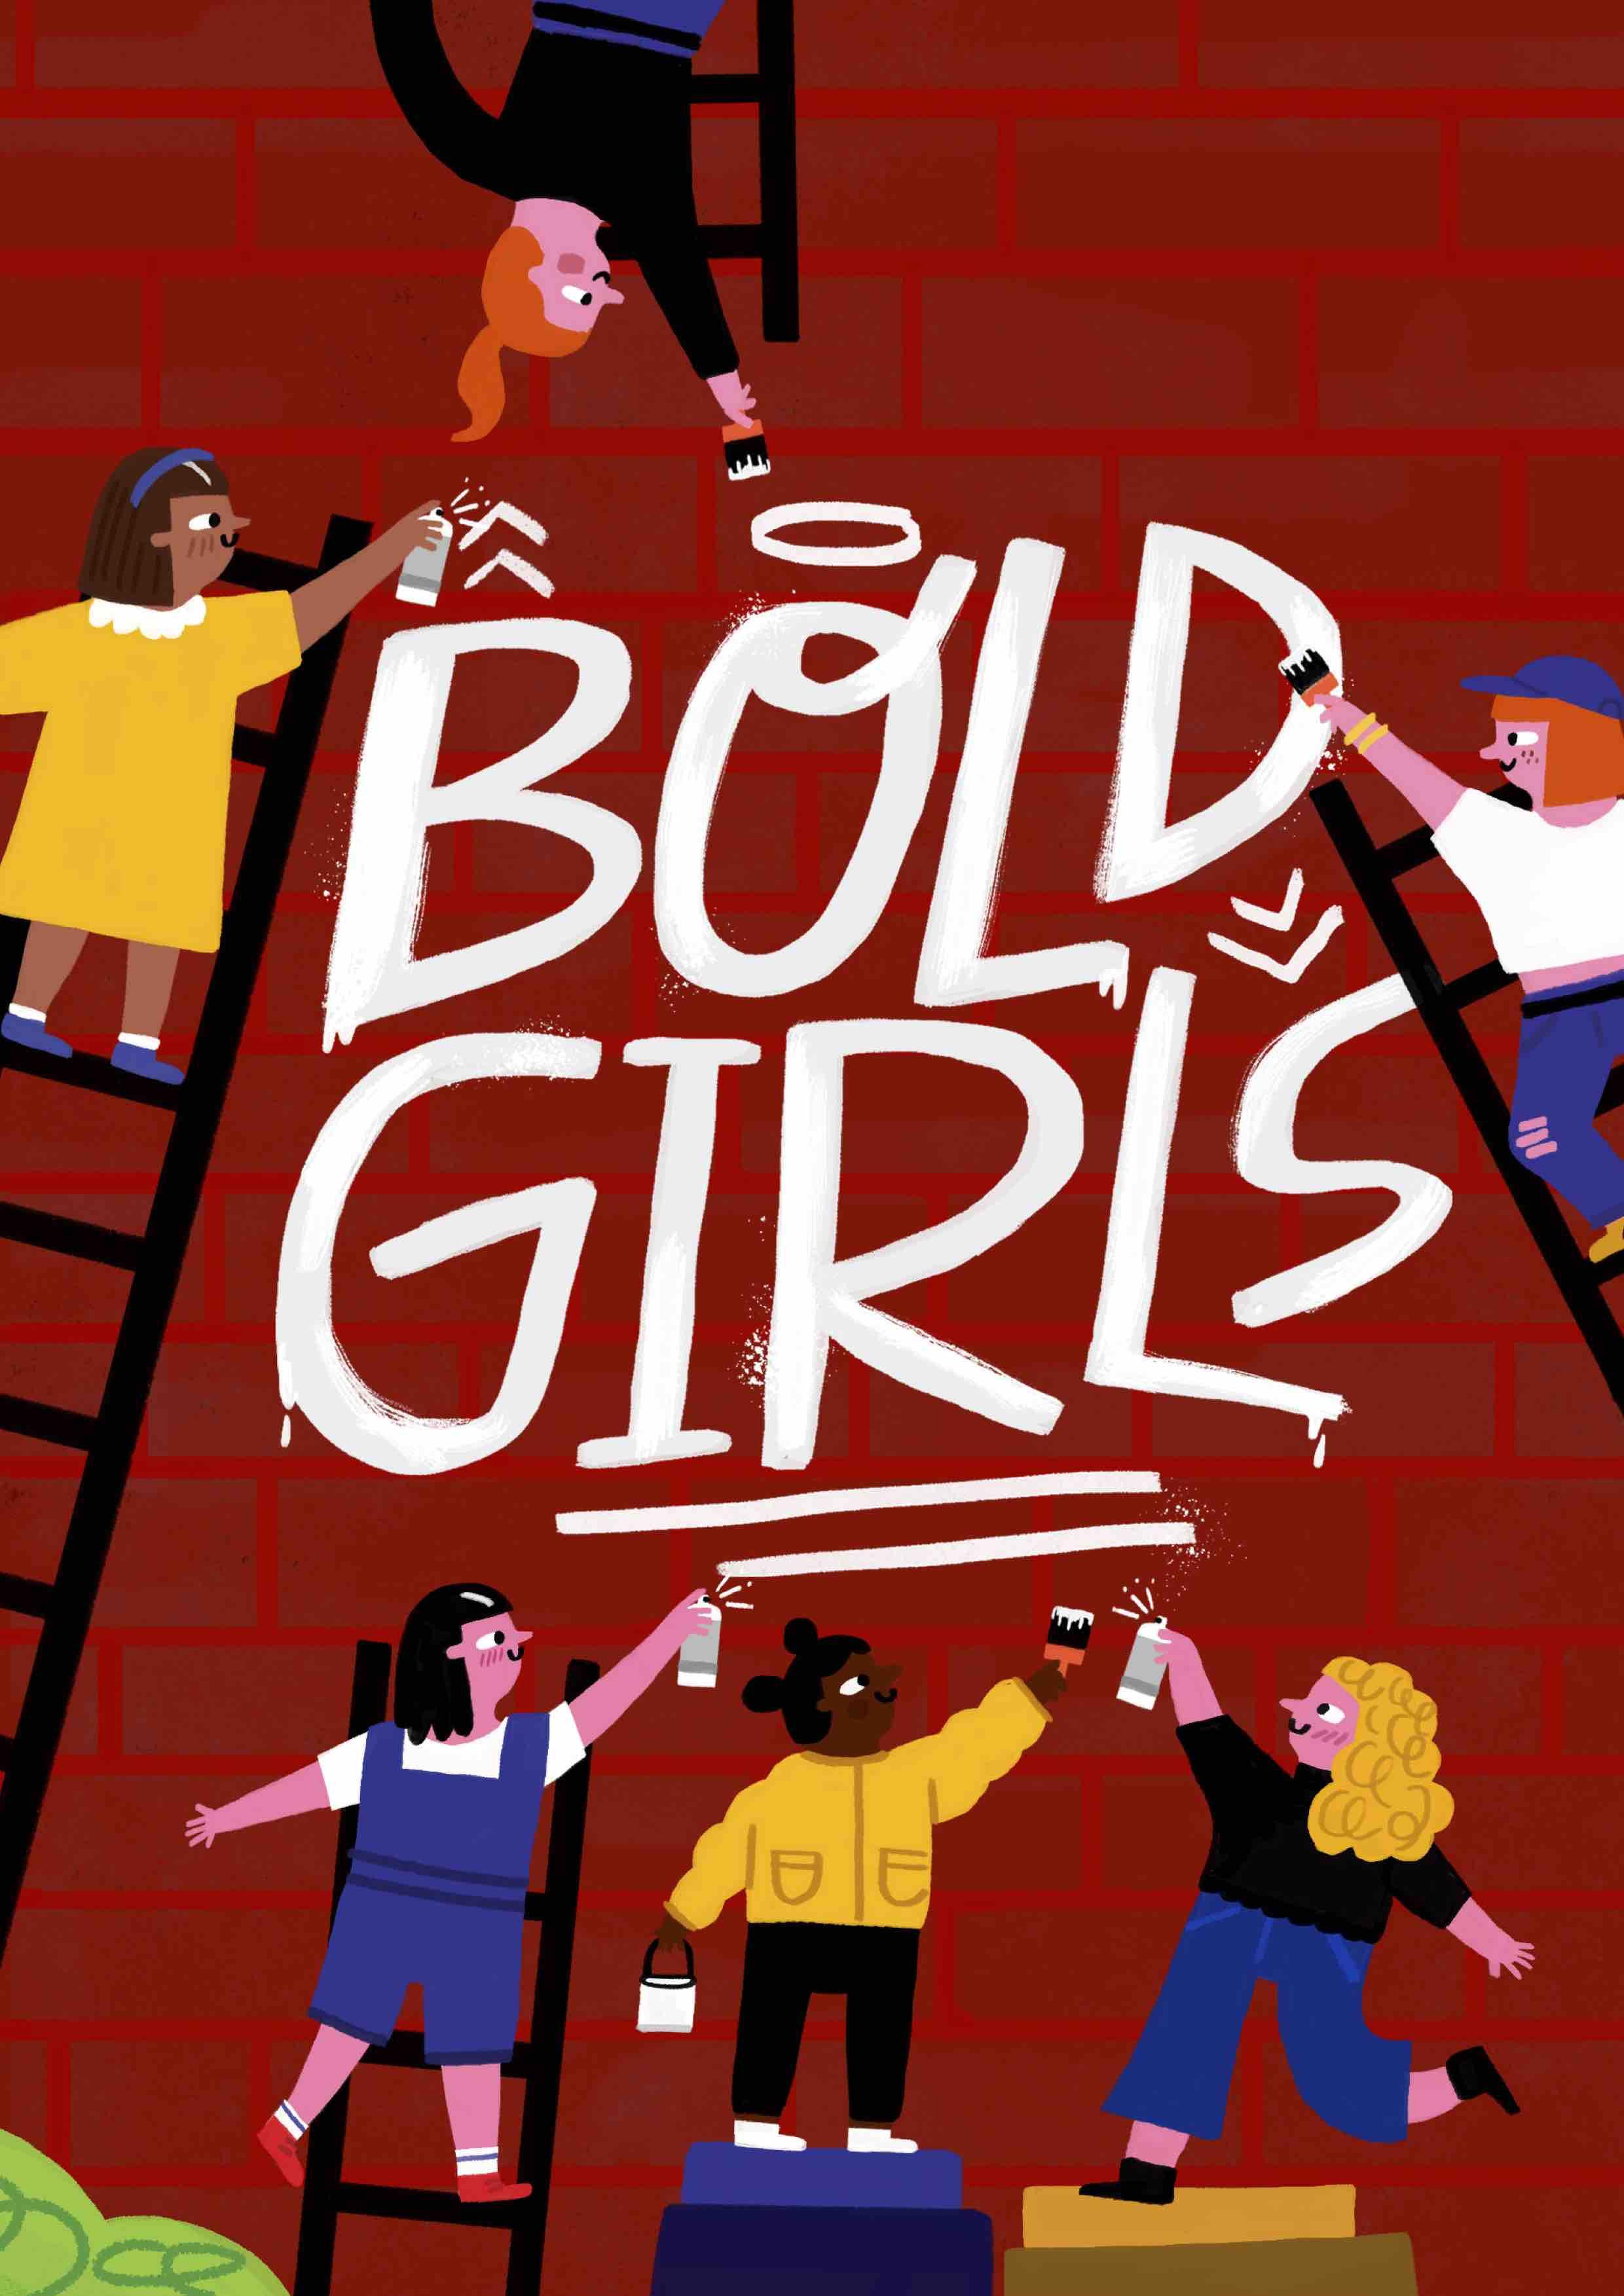 BOLD-GIRLS_image.jpg